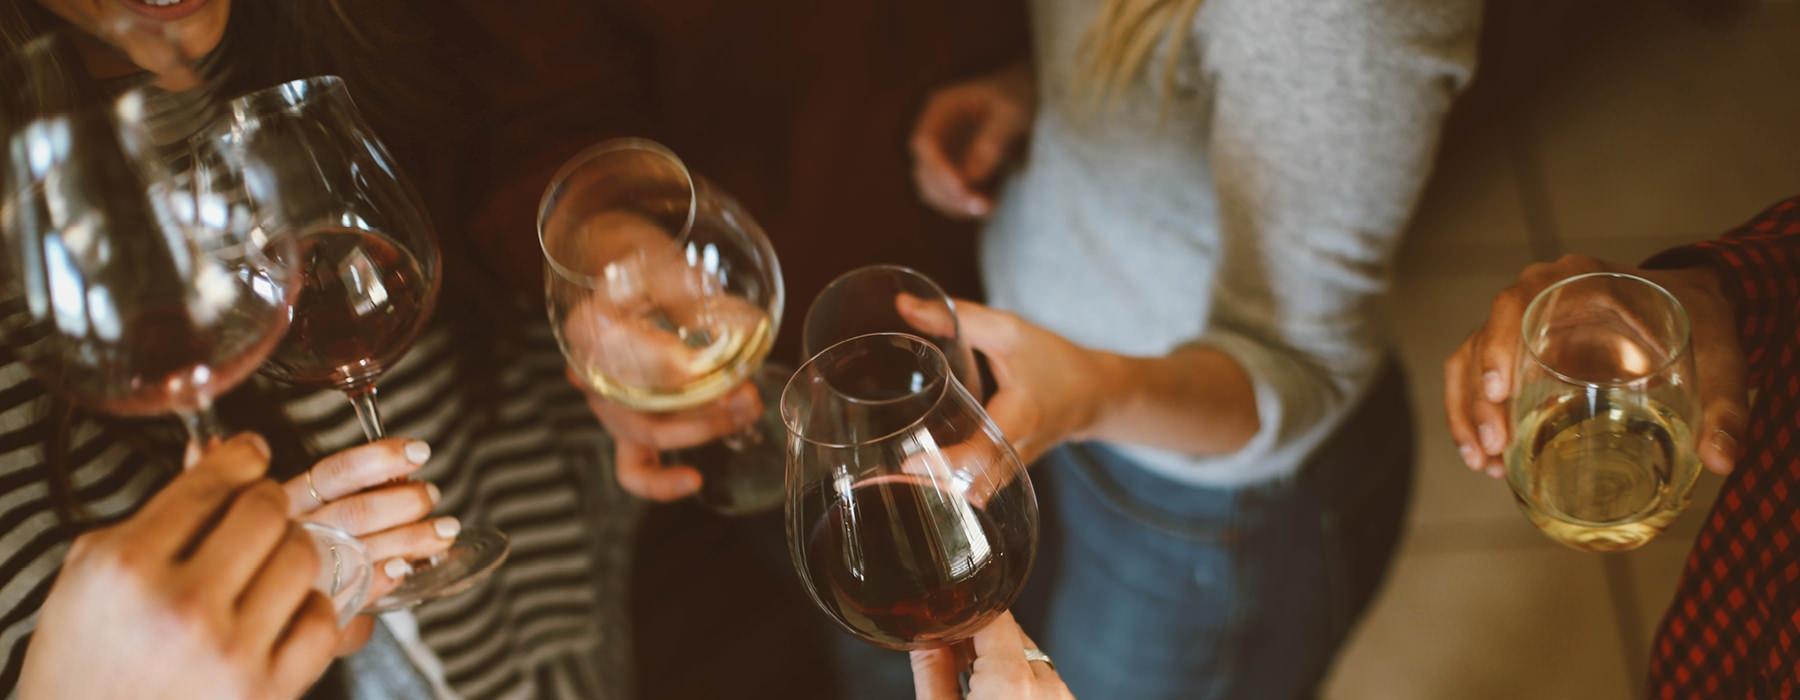 friends enjoying wine in neighborhood restaurant